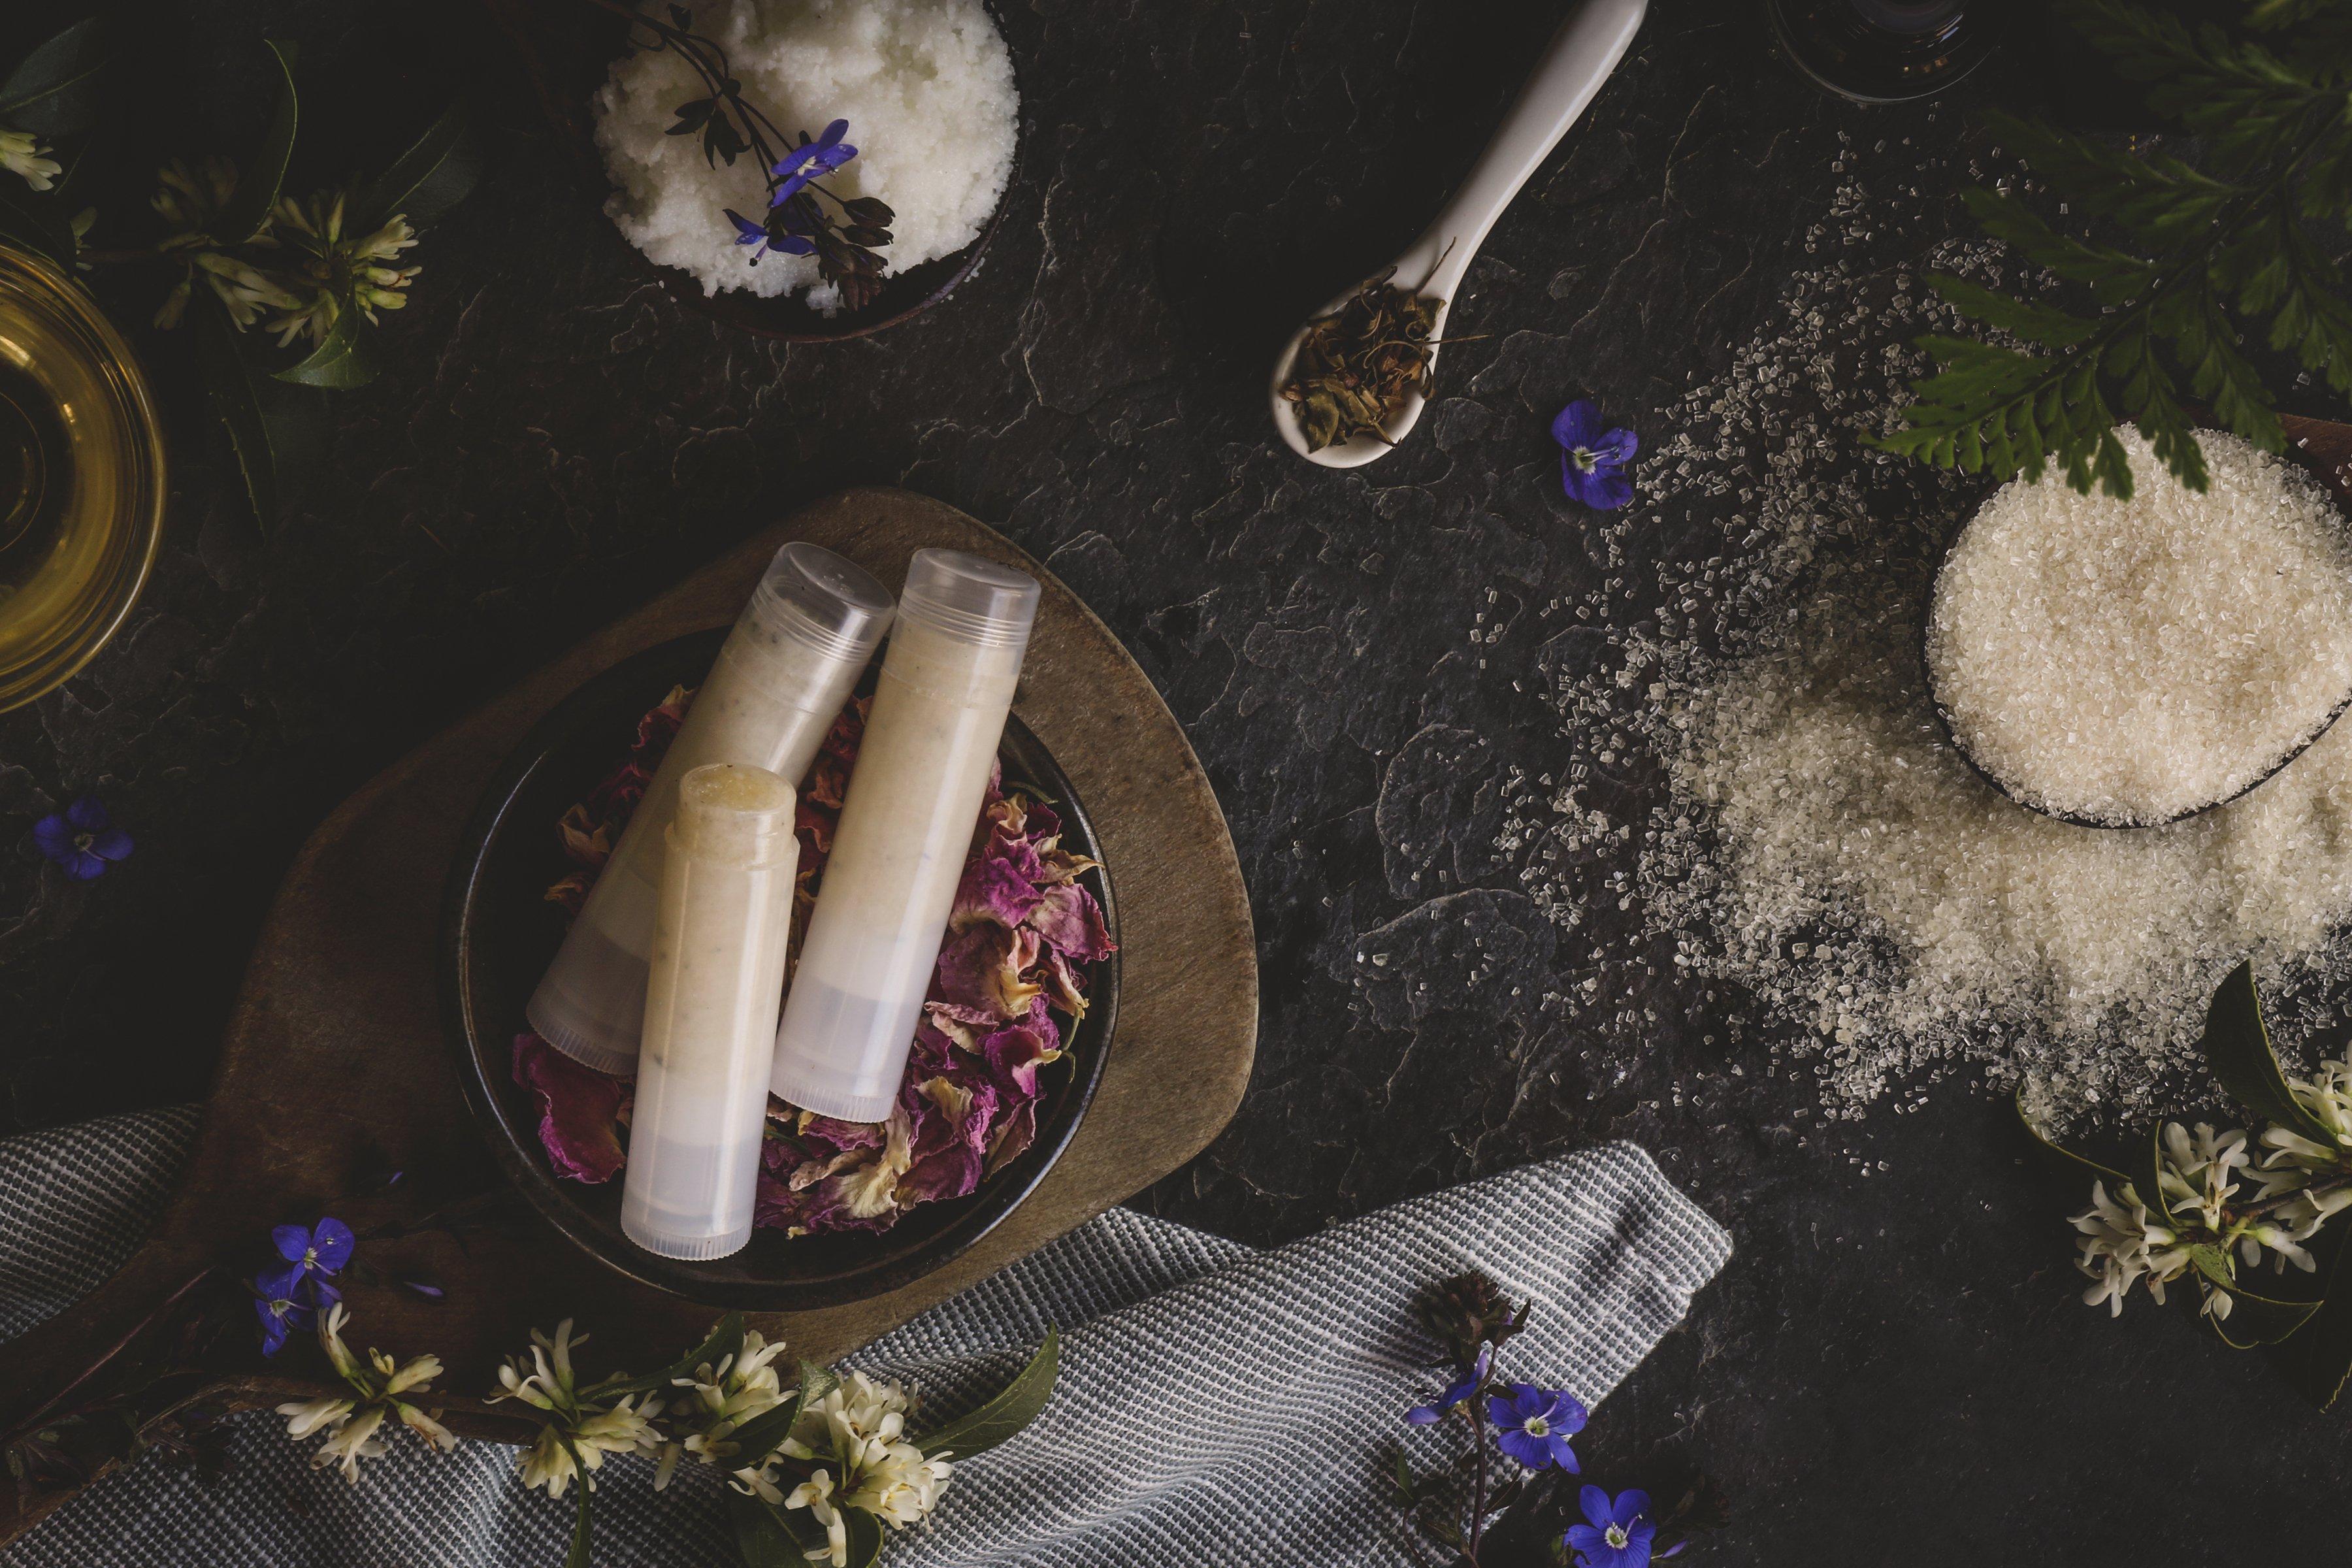 Display of lip balm tubes, salts, DIY ingredients and small purple flowers.